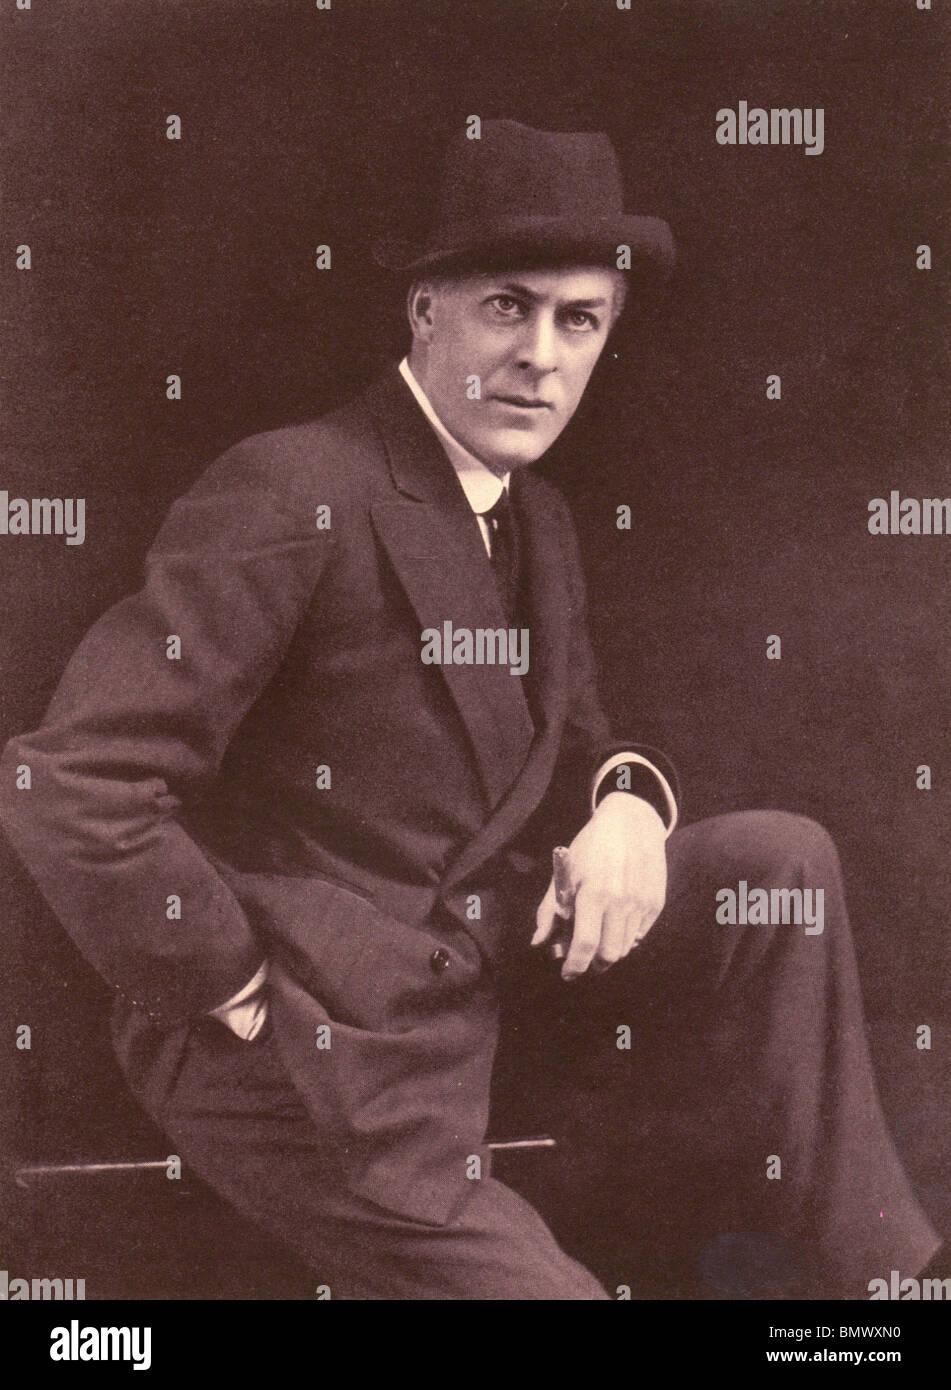 Alexander Galibin: biography, personal life (photo) 4